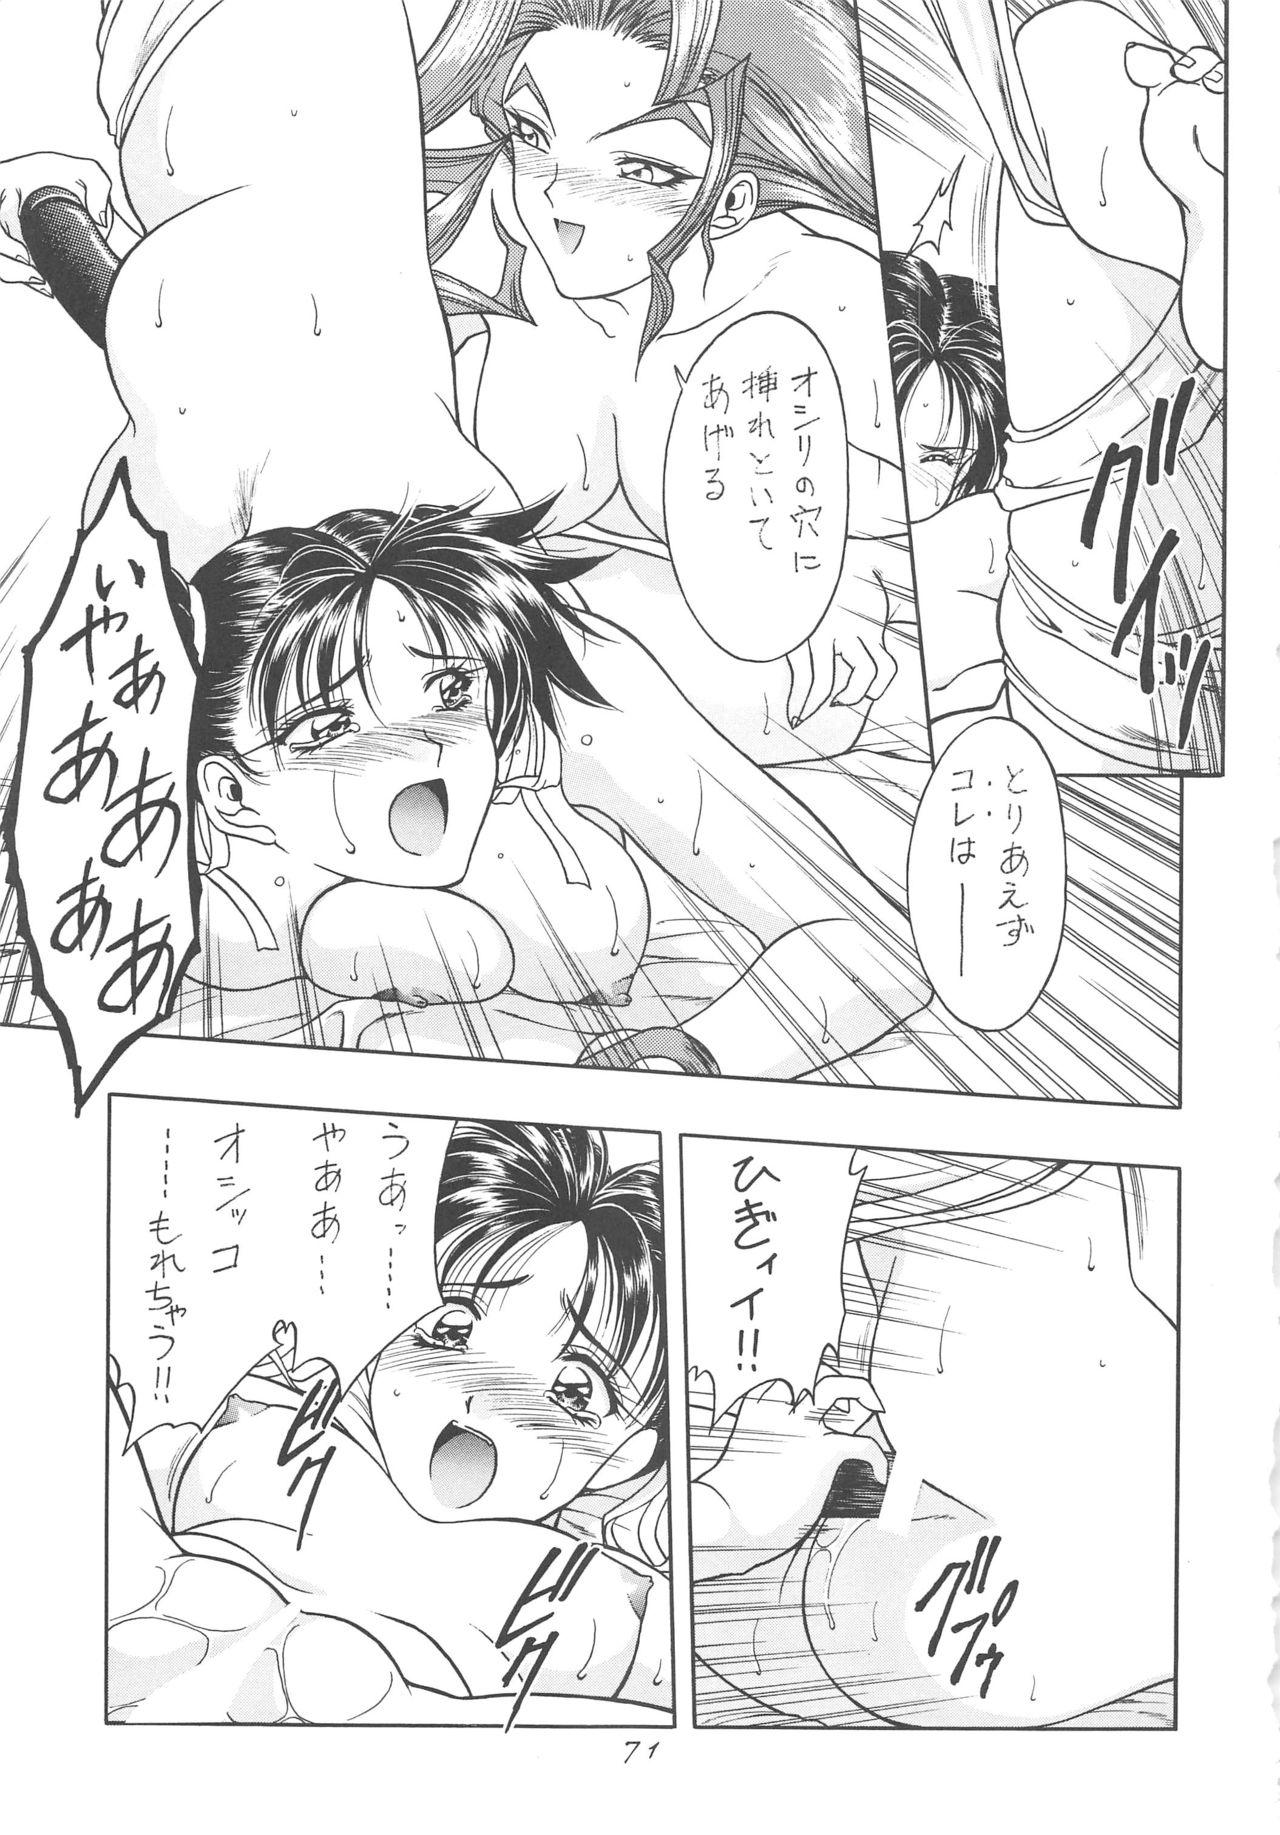 INDIVIDUAL 3 - 19930816 → 70